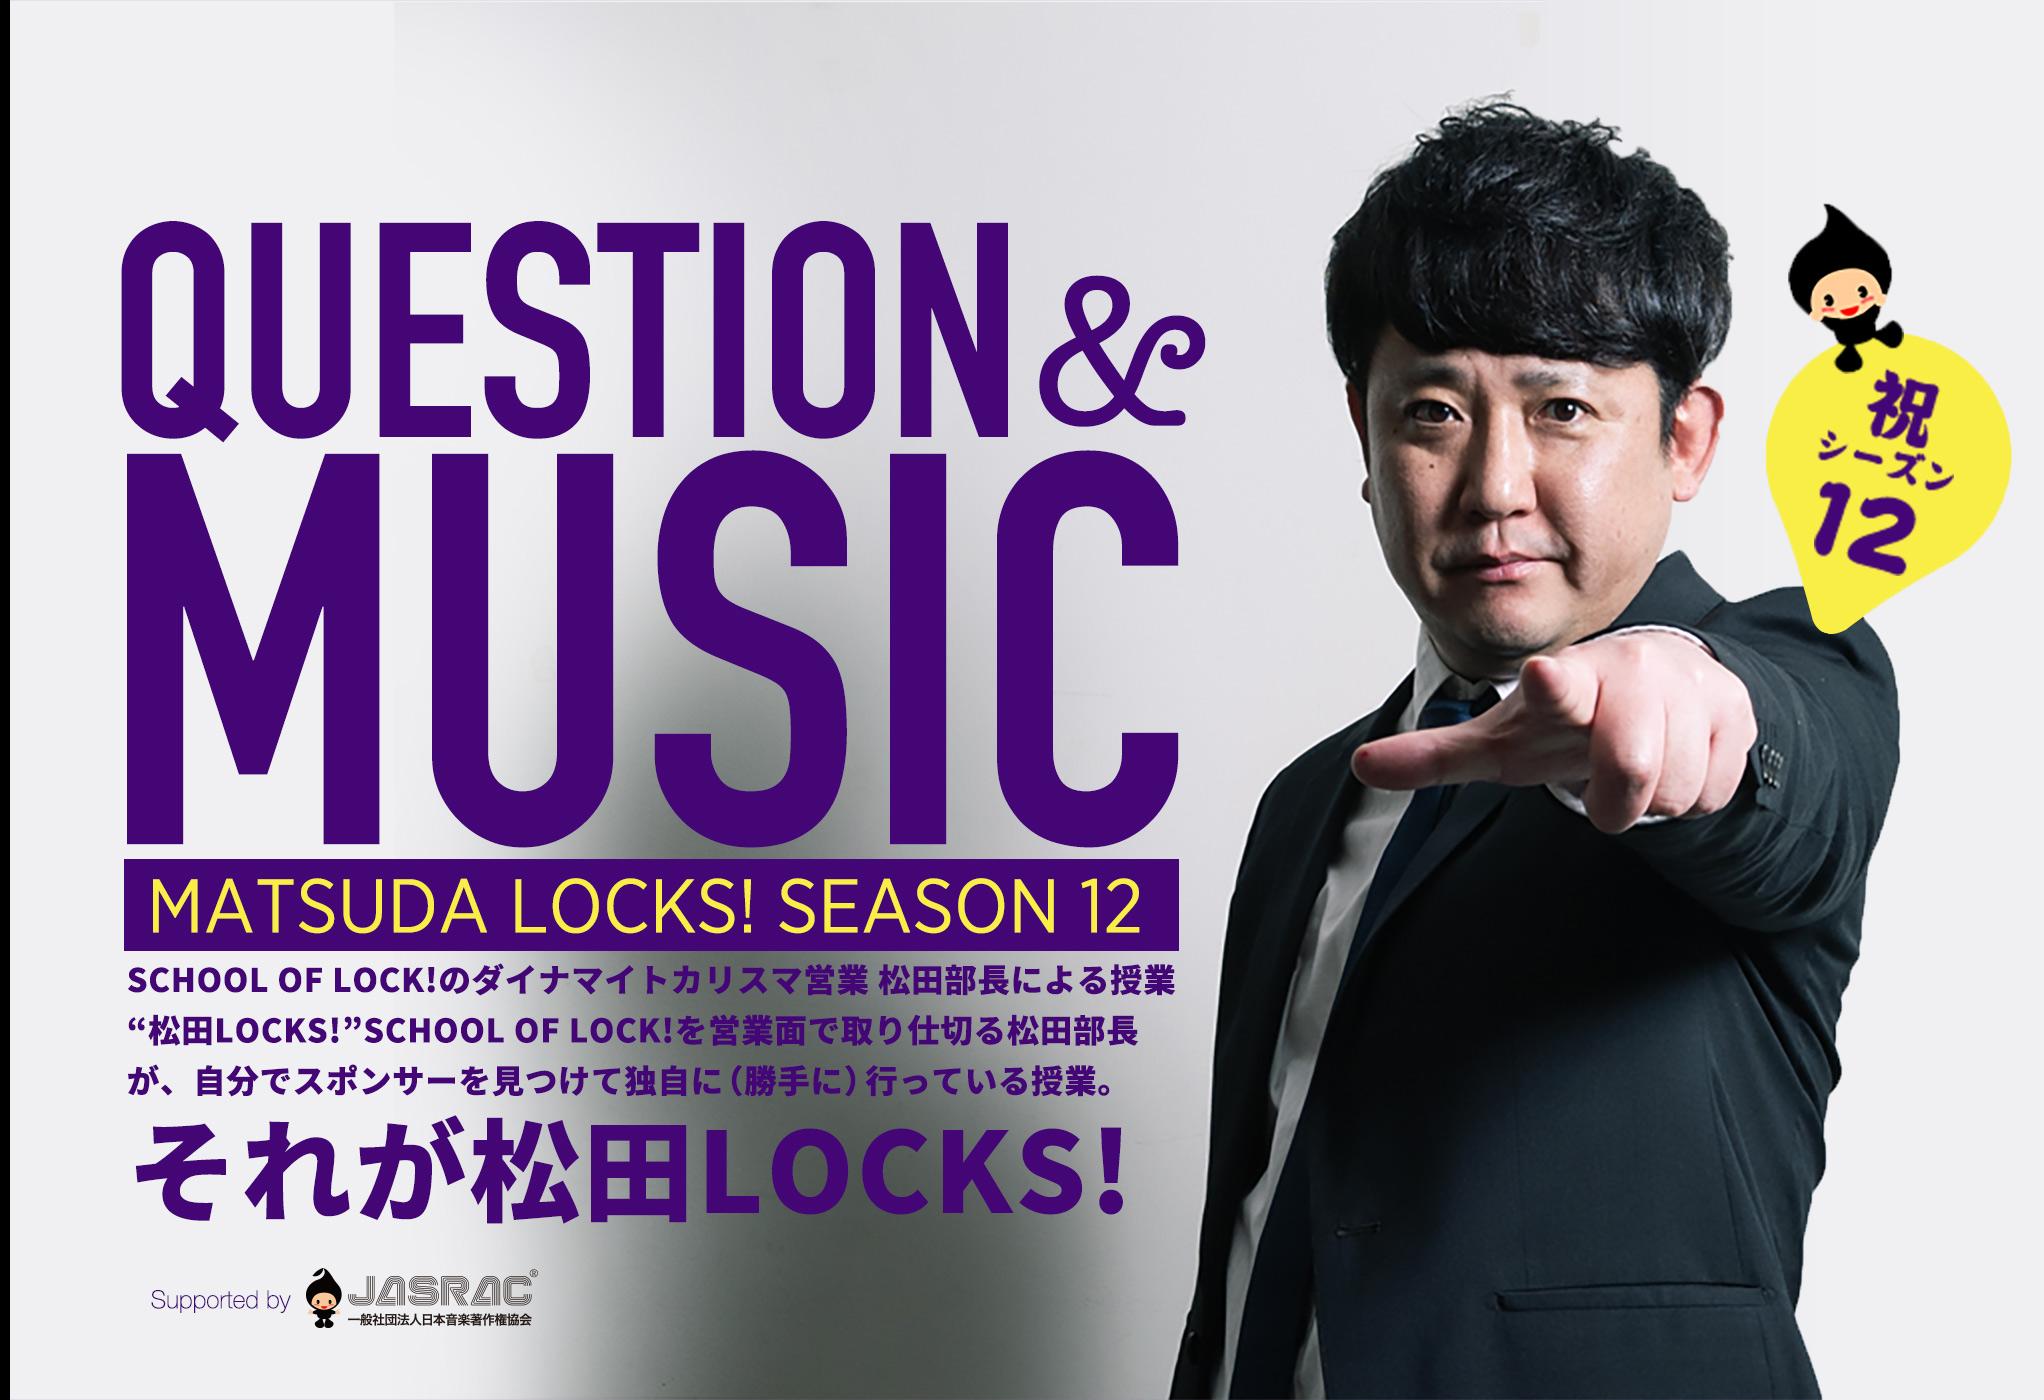 SCHOOL OF LOCK! | 松田LOCKS! SEASON12 Question & Music supported by JASRAC